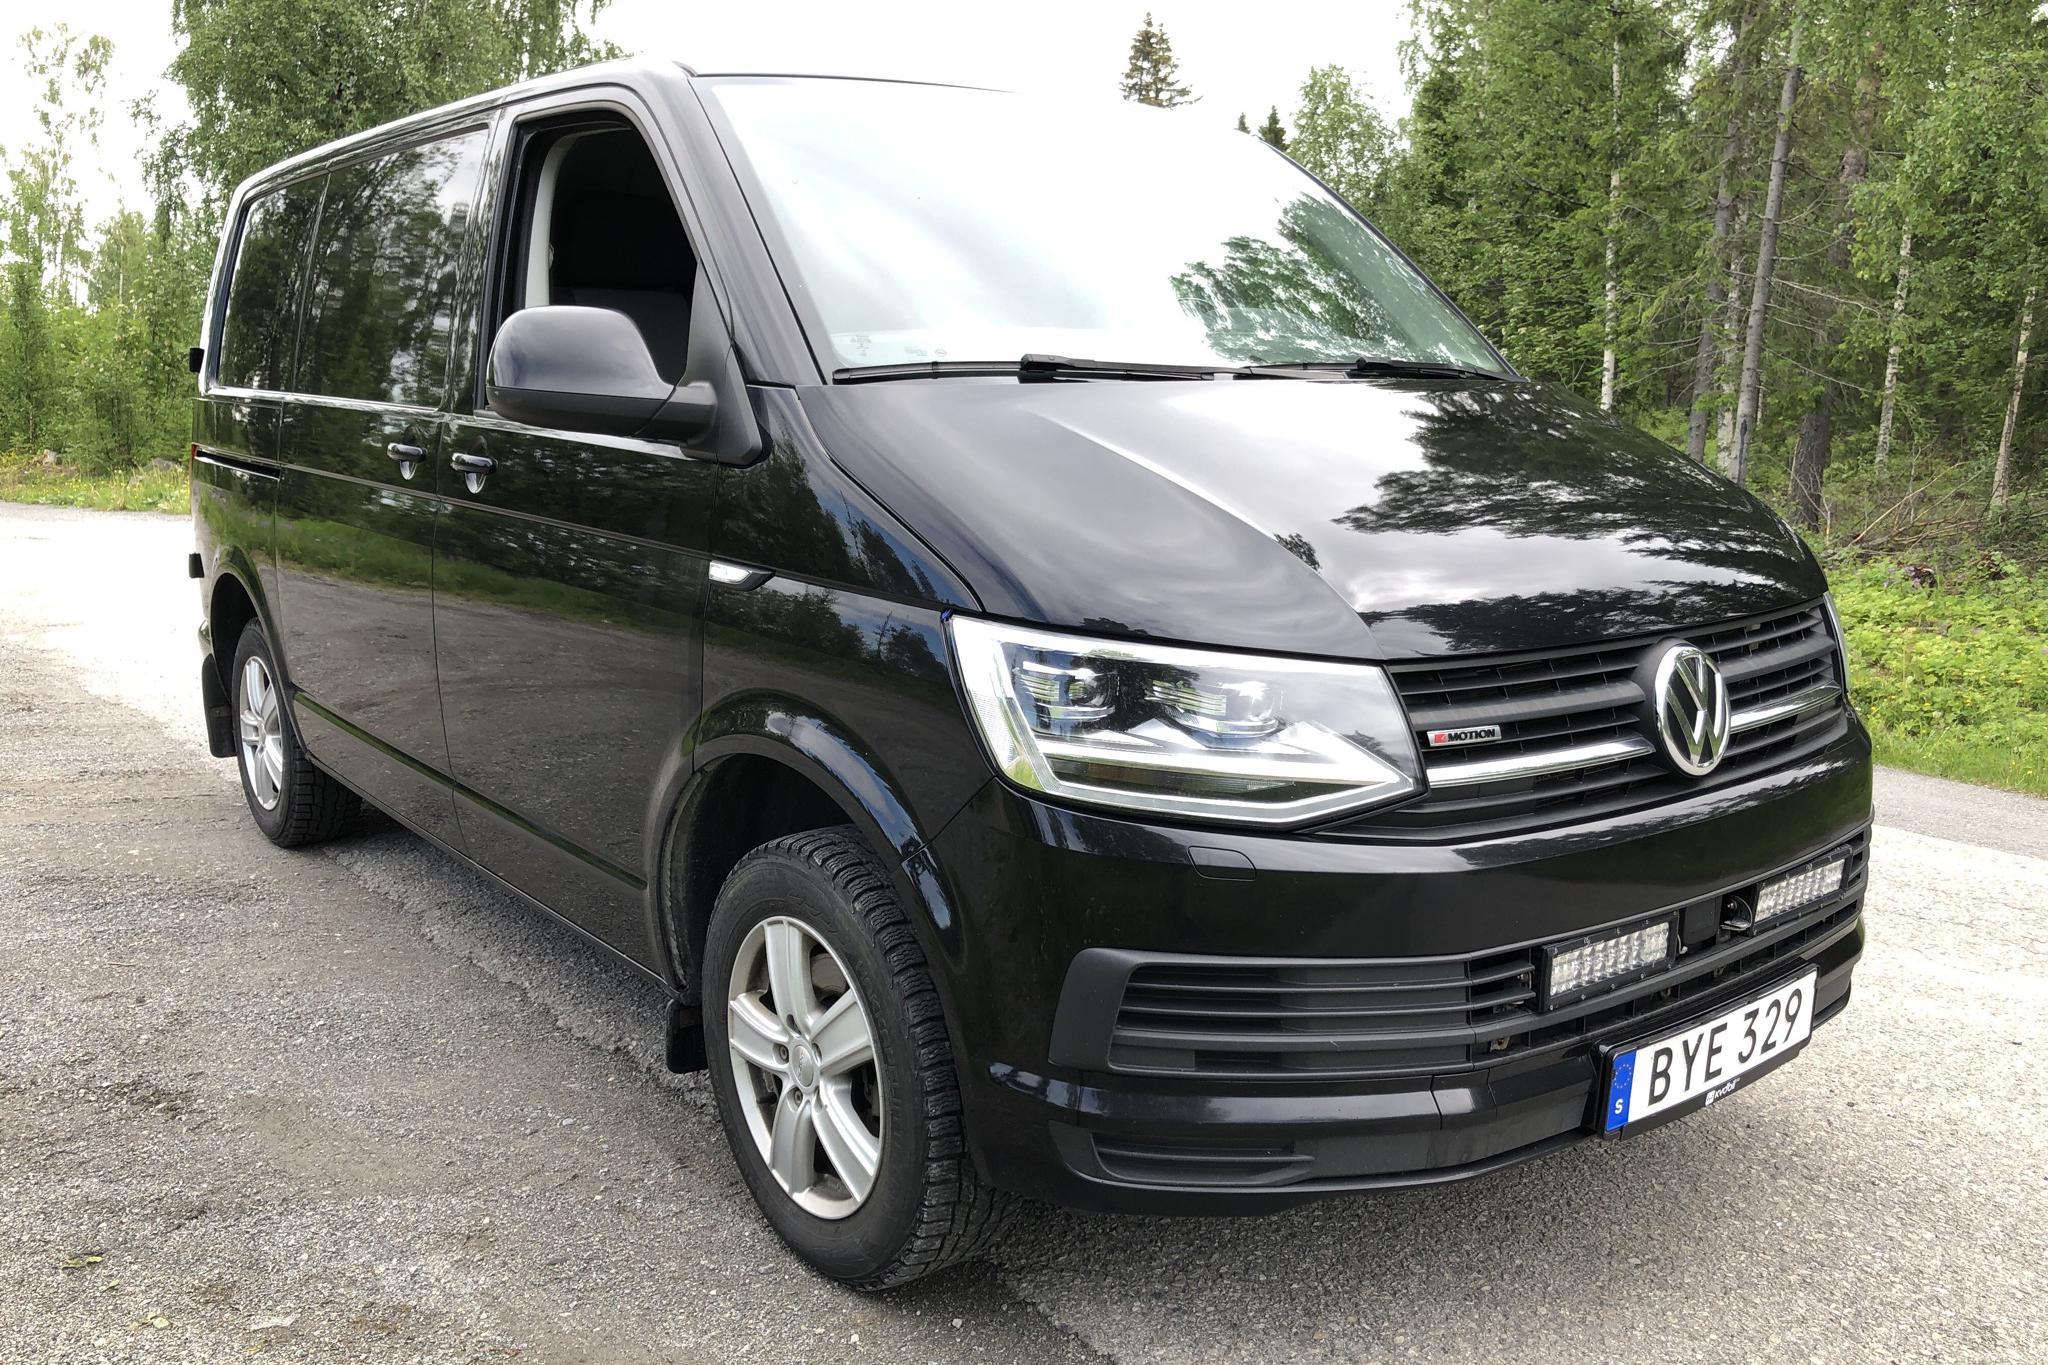 VW Transporter T6 2.0 TDI BMT Skåp 4MOTION (150hk) - 15 711 mil - Automat - svart - 2017